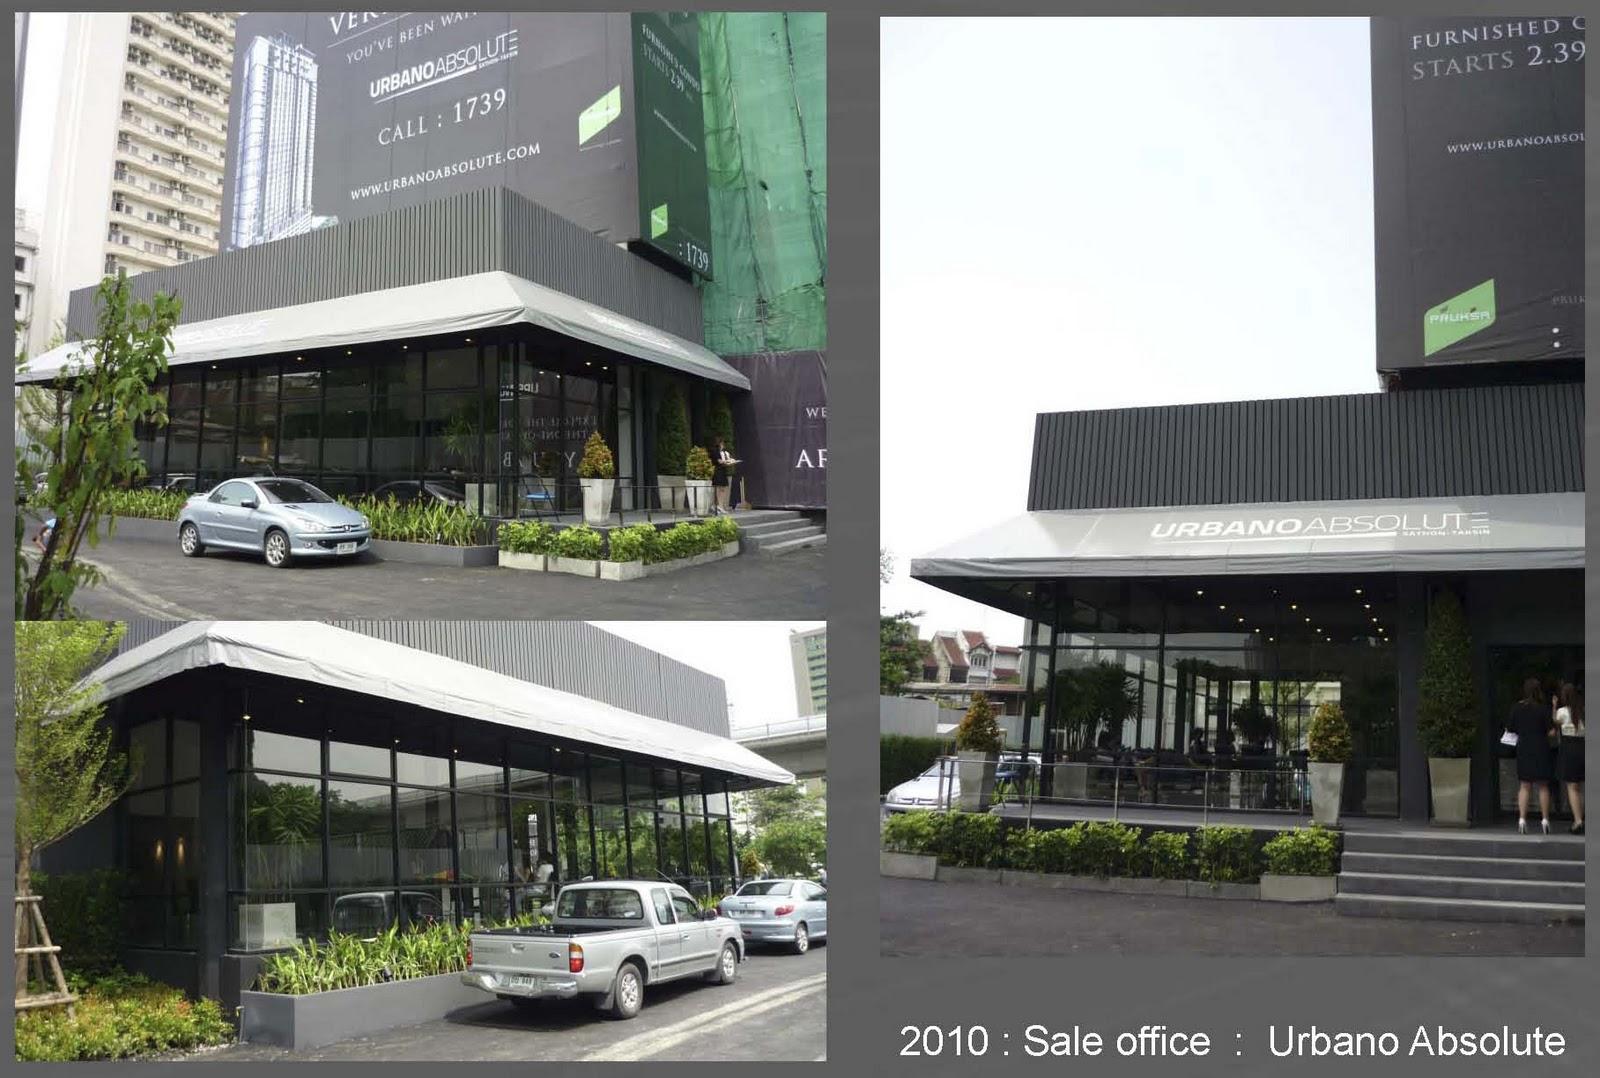 Commercial Architectural Design - Construction News, Blogs